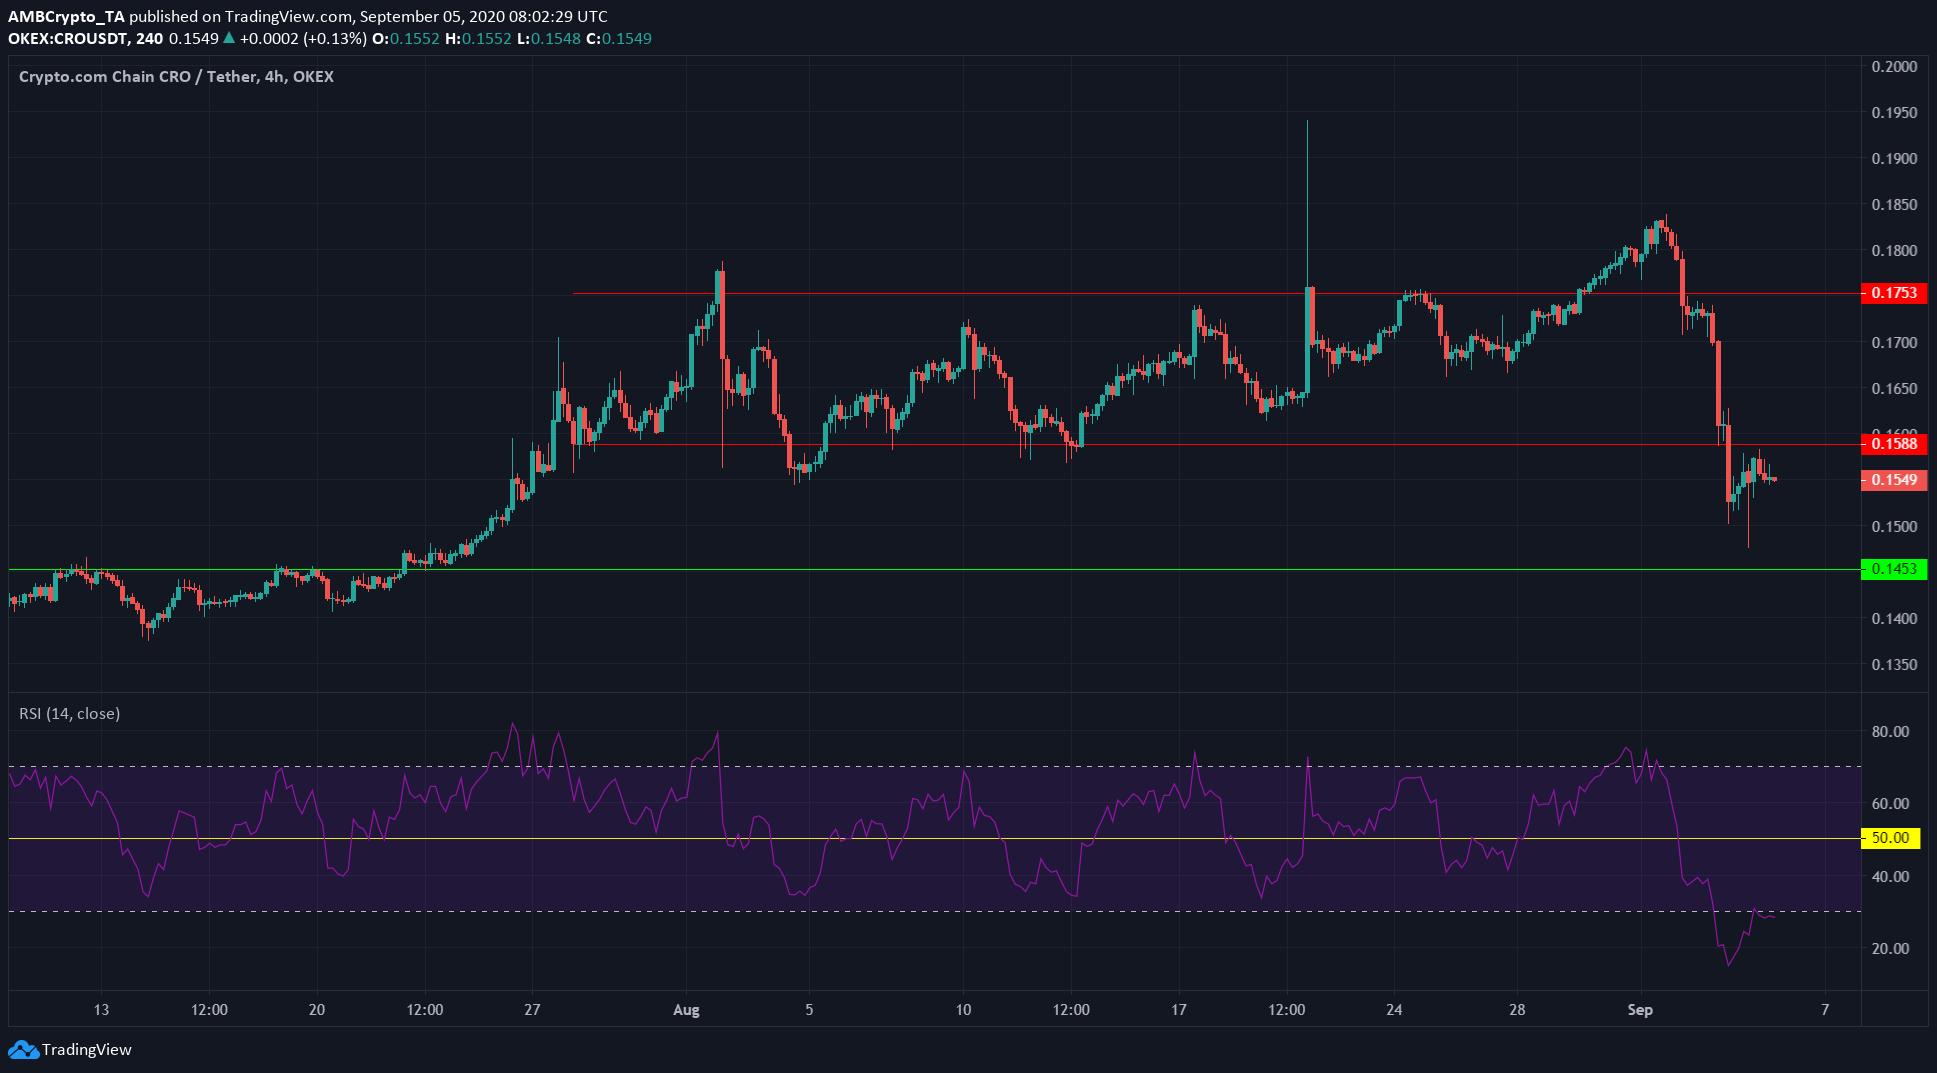 Tron, Polkadot, Crypto.com Coin Price Analysis: 5 September